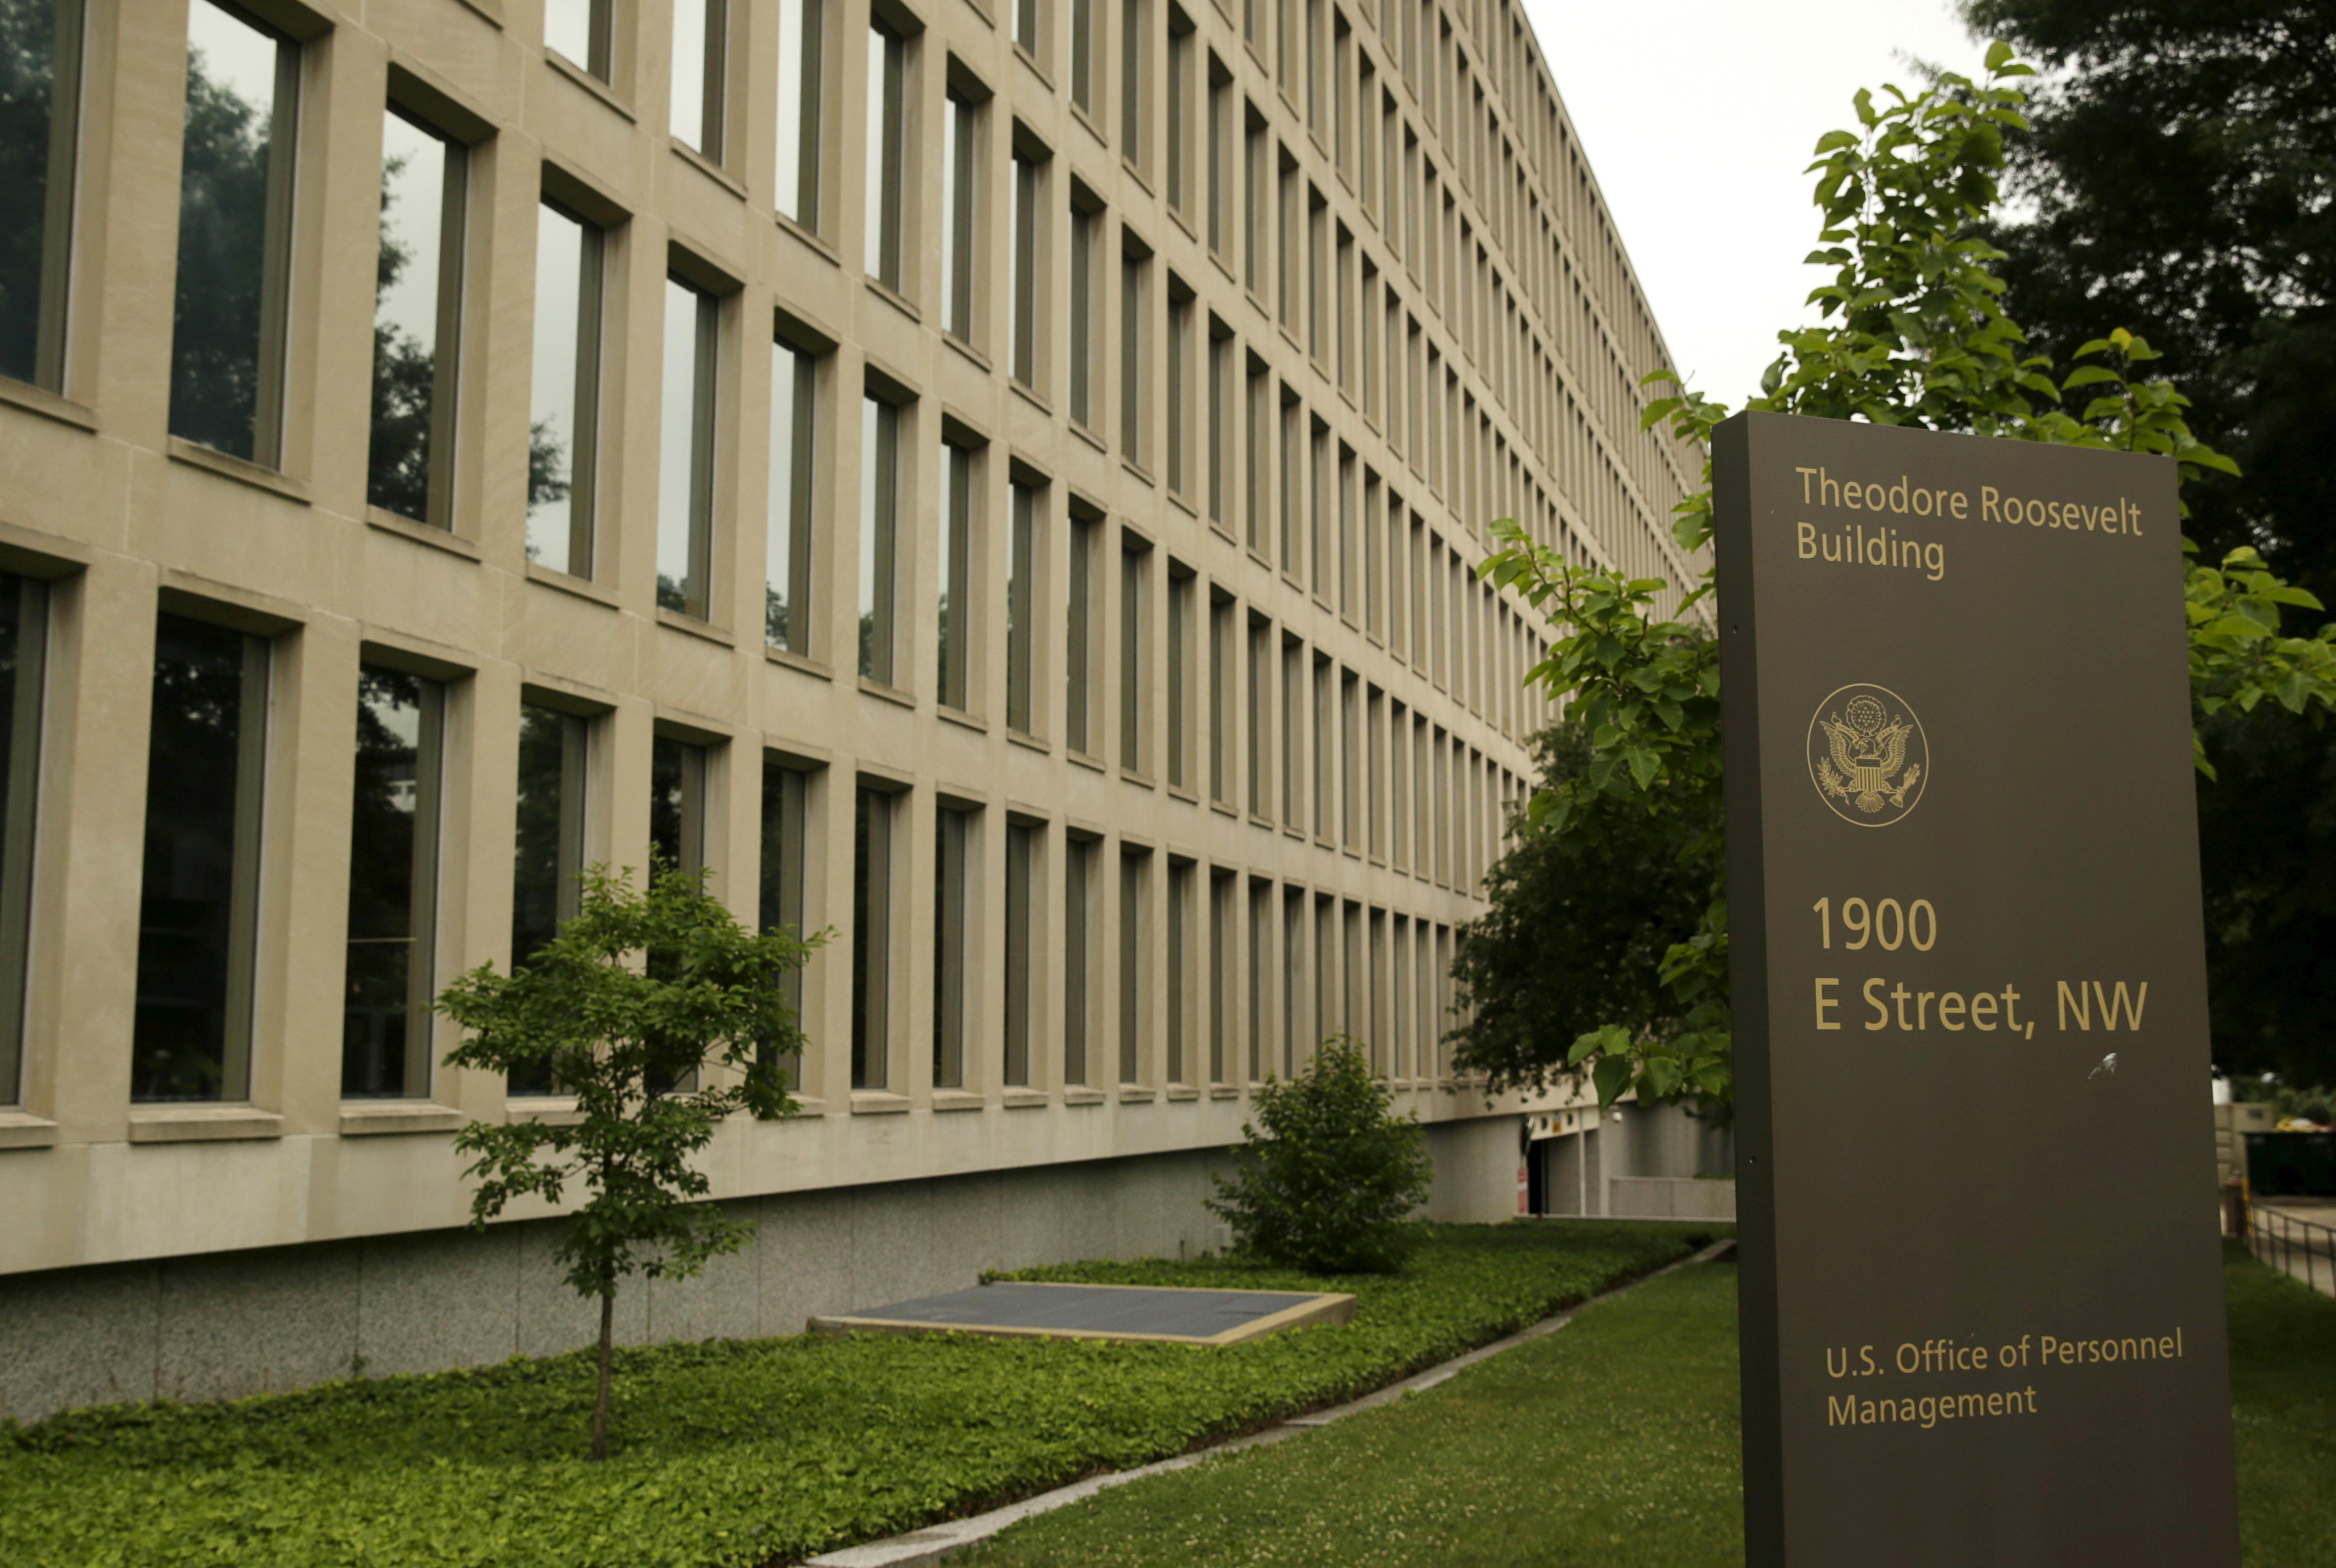 Top secret: Trump's revamp of U.S. security clearances stumbling - officials, report